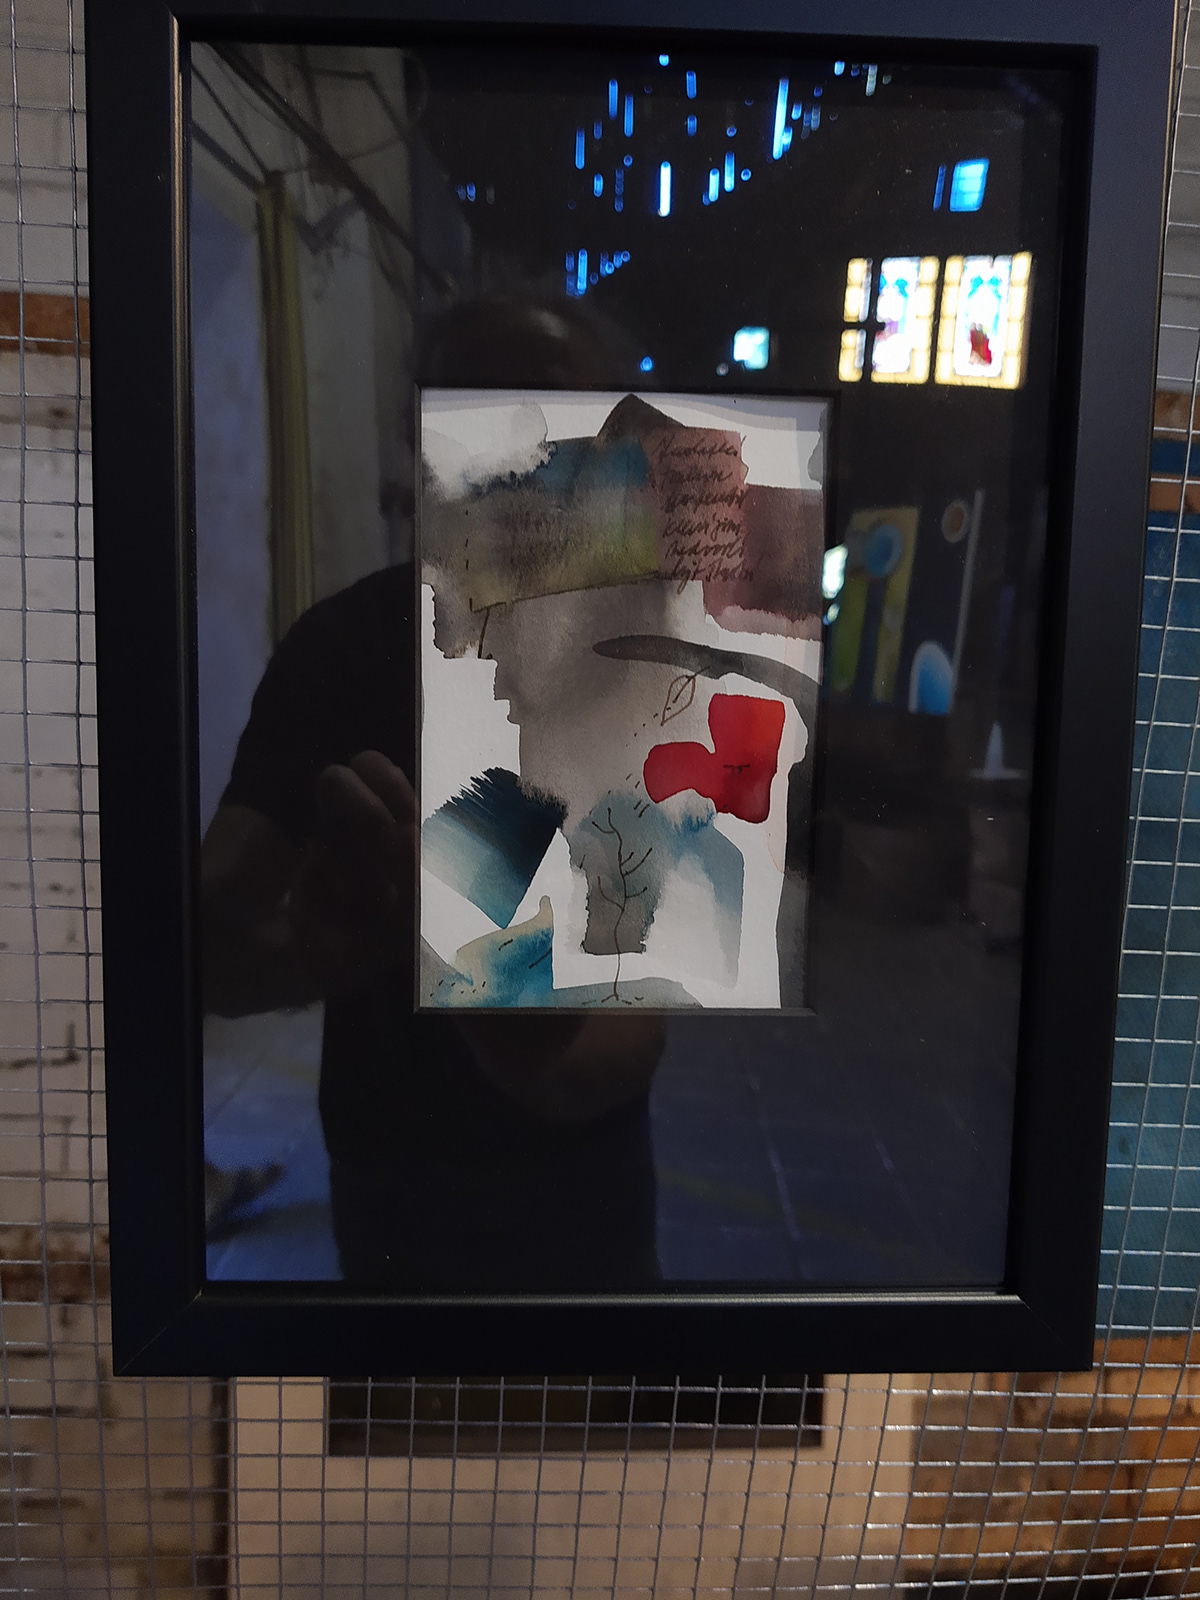 akryl art Exhibition  Glasswork Tasice industrial Michaela Bartonova obrazy Paintings visual art výstava